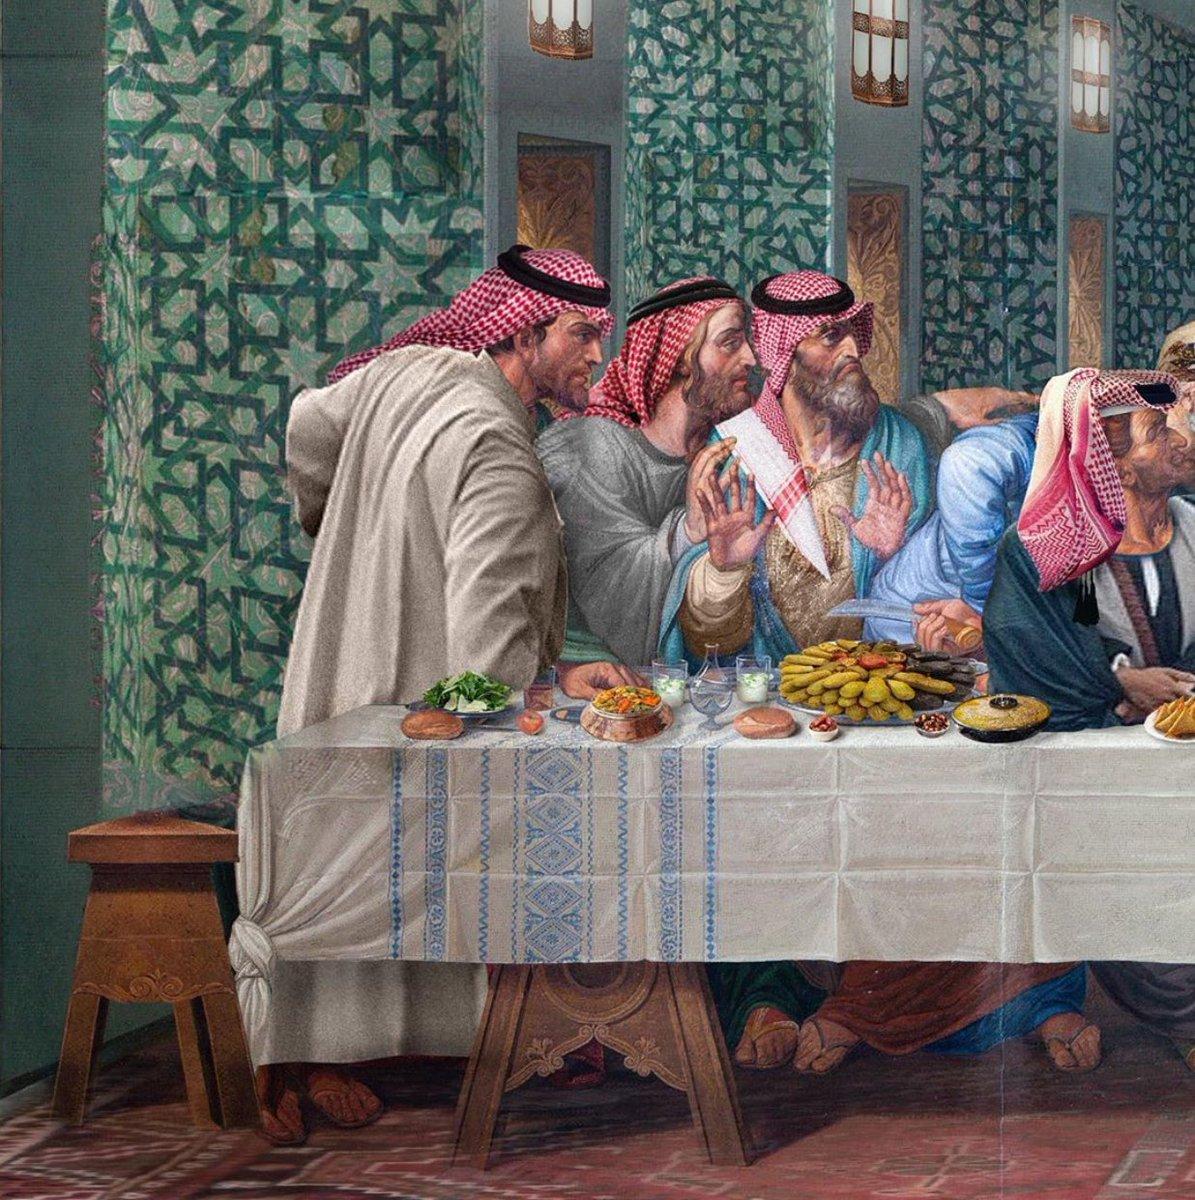 الفطور الاخير The Last Futoor  Work by Farah AlBastaki https://t.co/6UdBq54j98